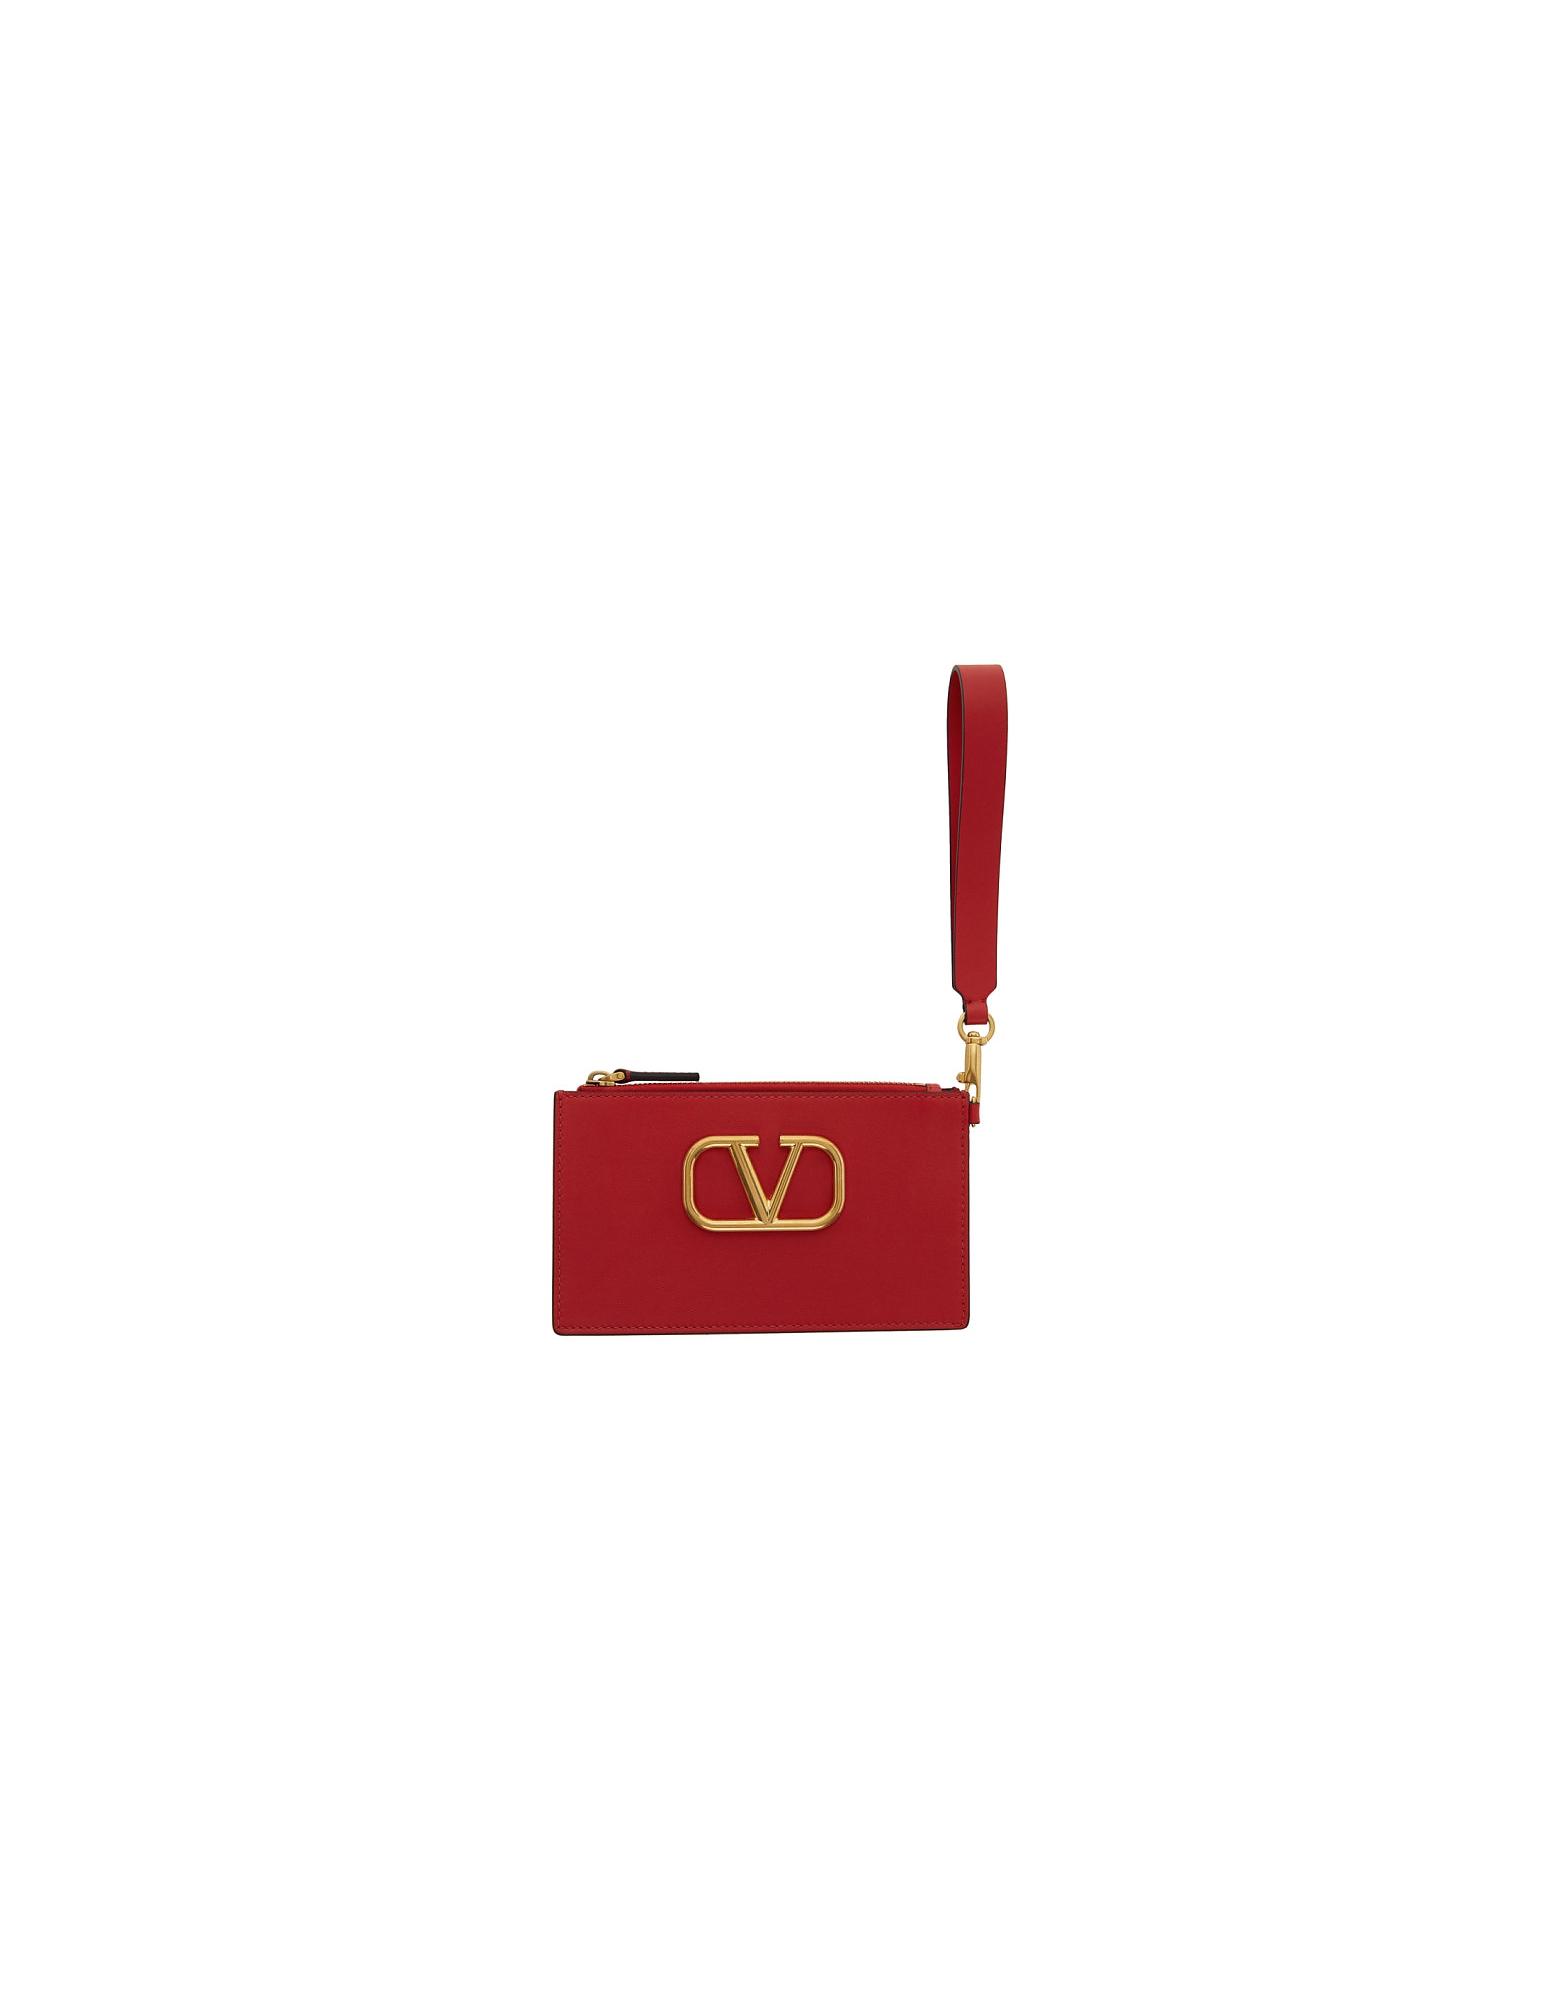 Valentino Designer Handbags, Red Valentino Garavani VLogo Pouch